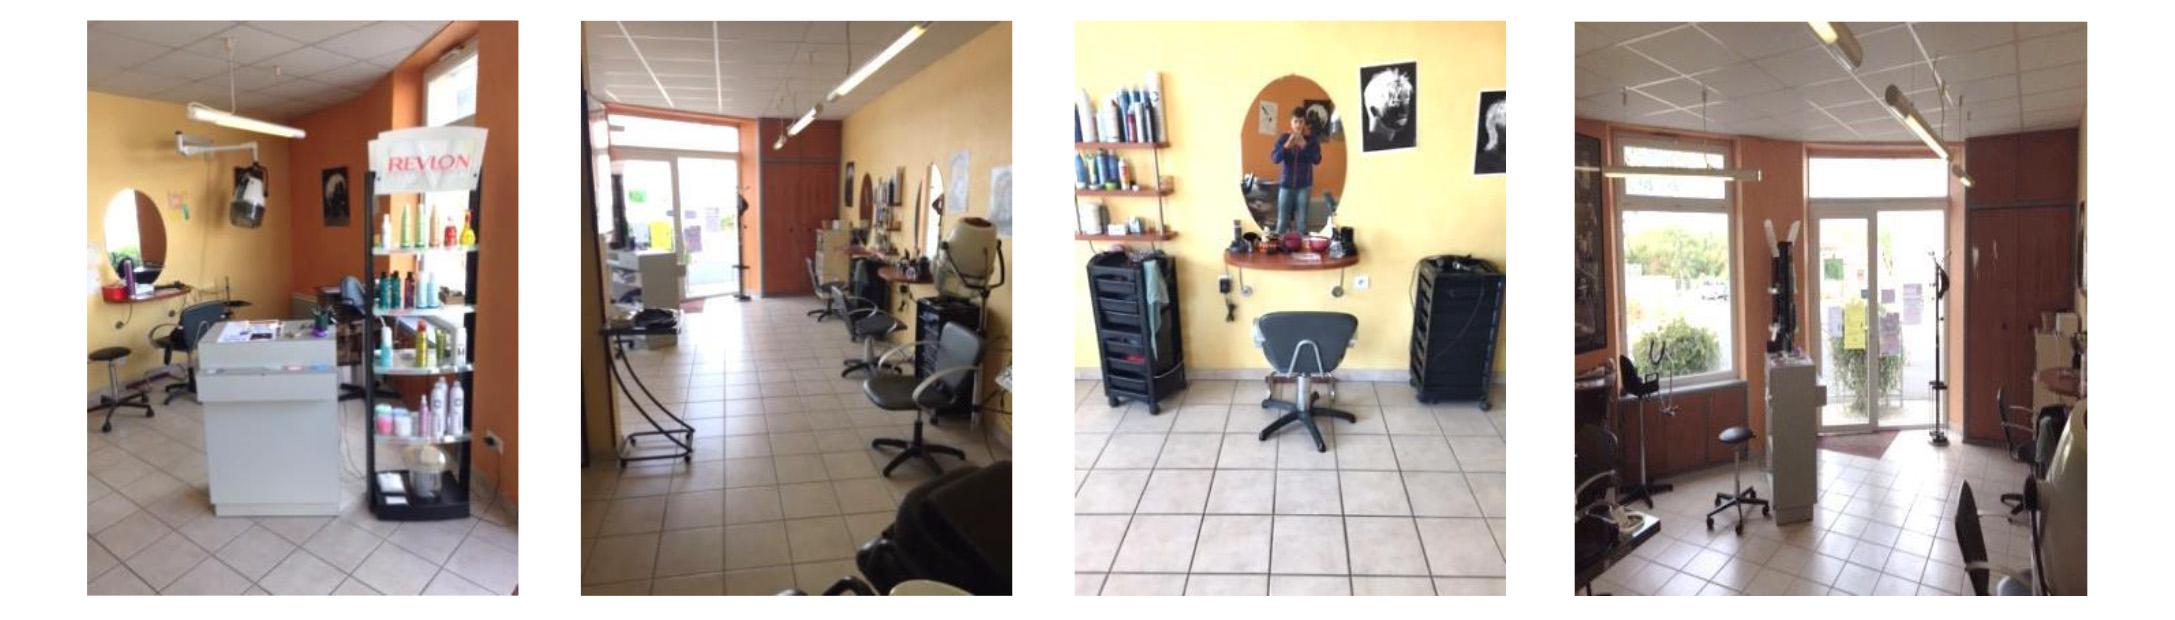 Salon de coiffure vendre maestris formation valence for Salon de l habitat valence